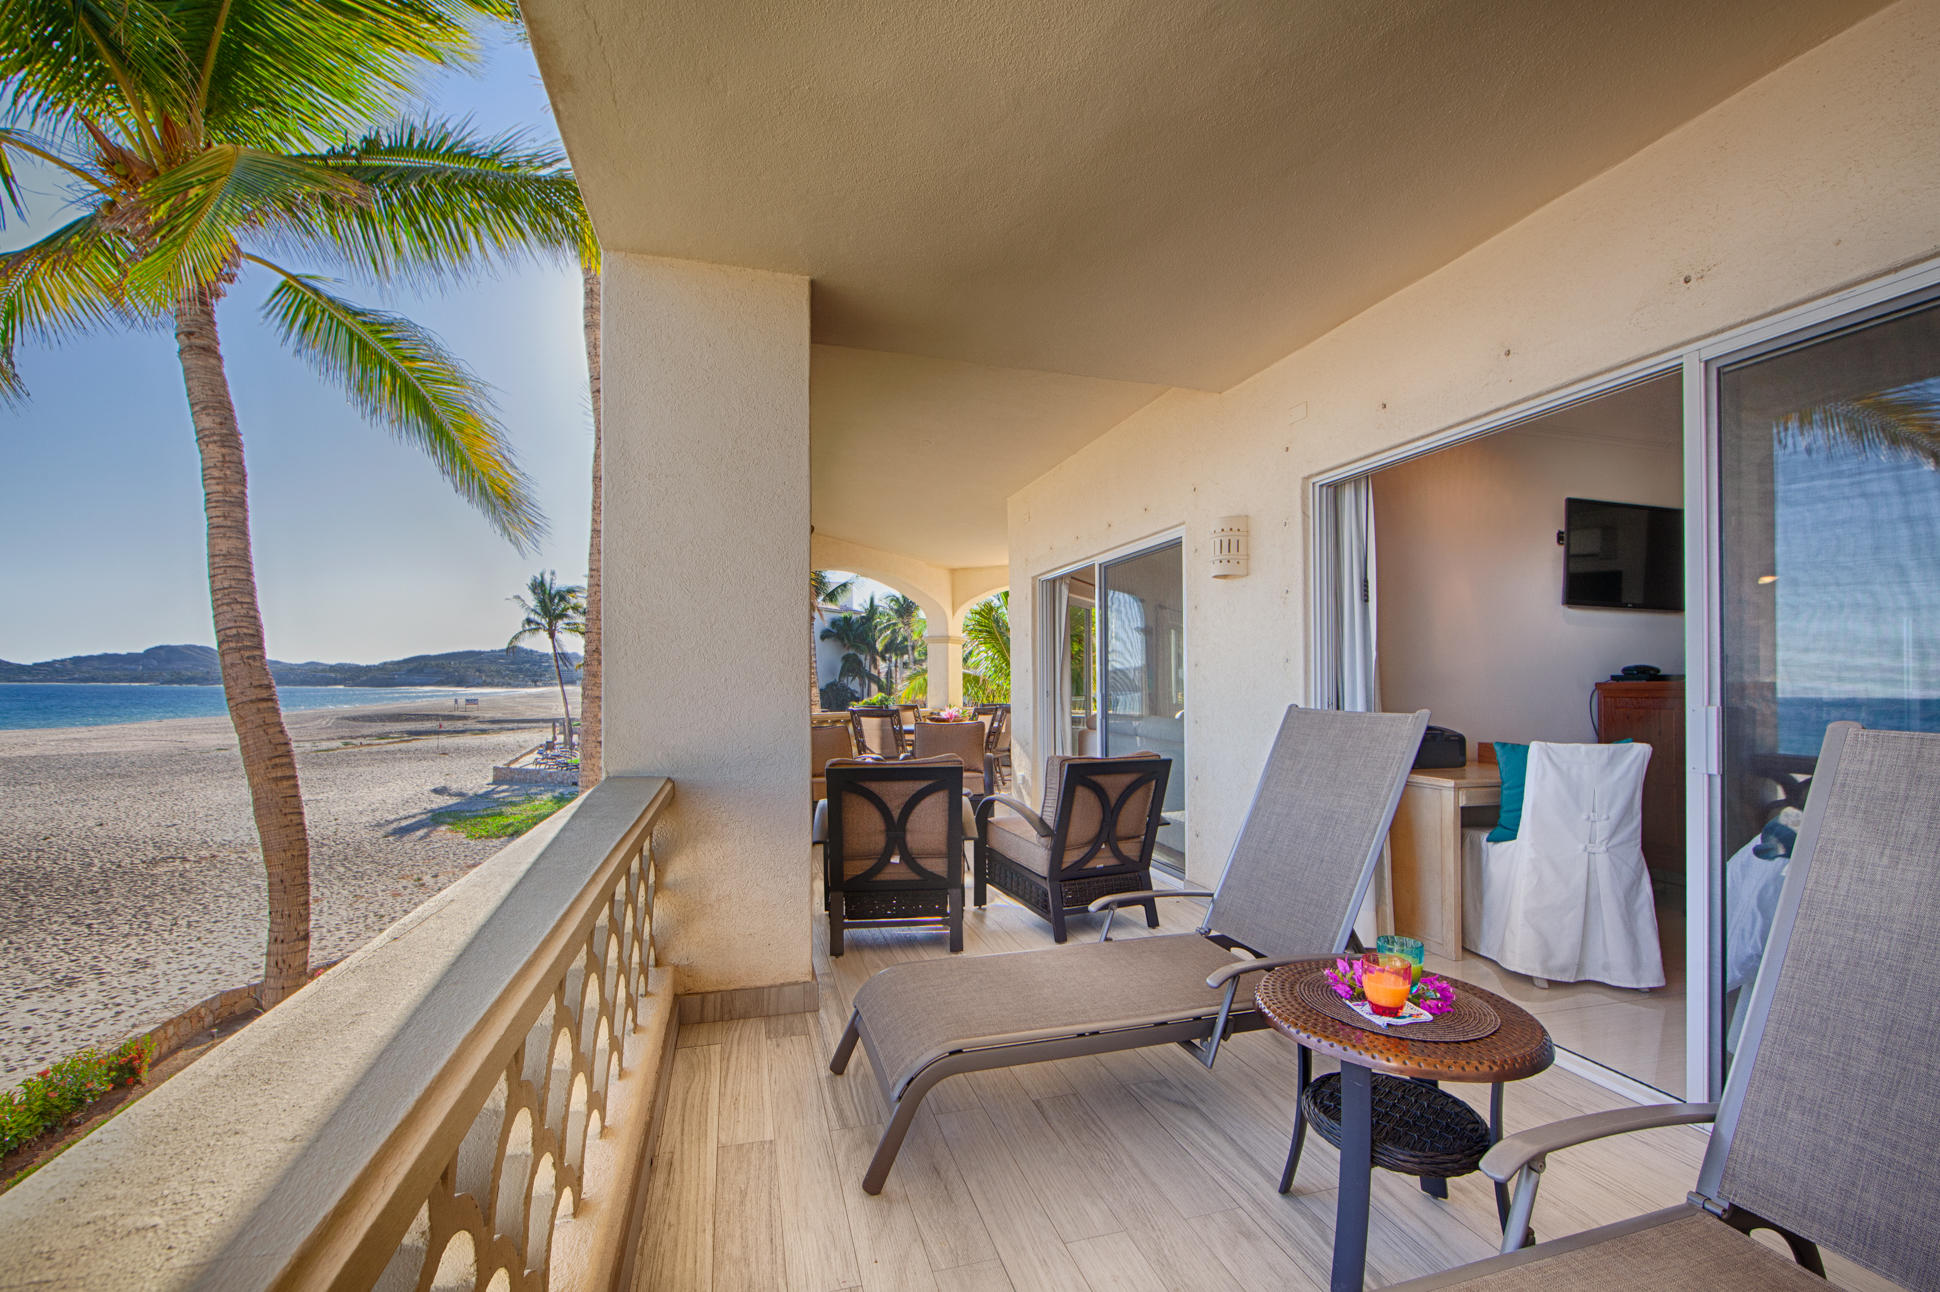 A3 Las Mananitas Beach Condo-7